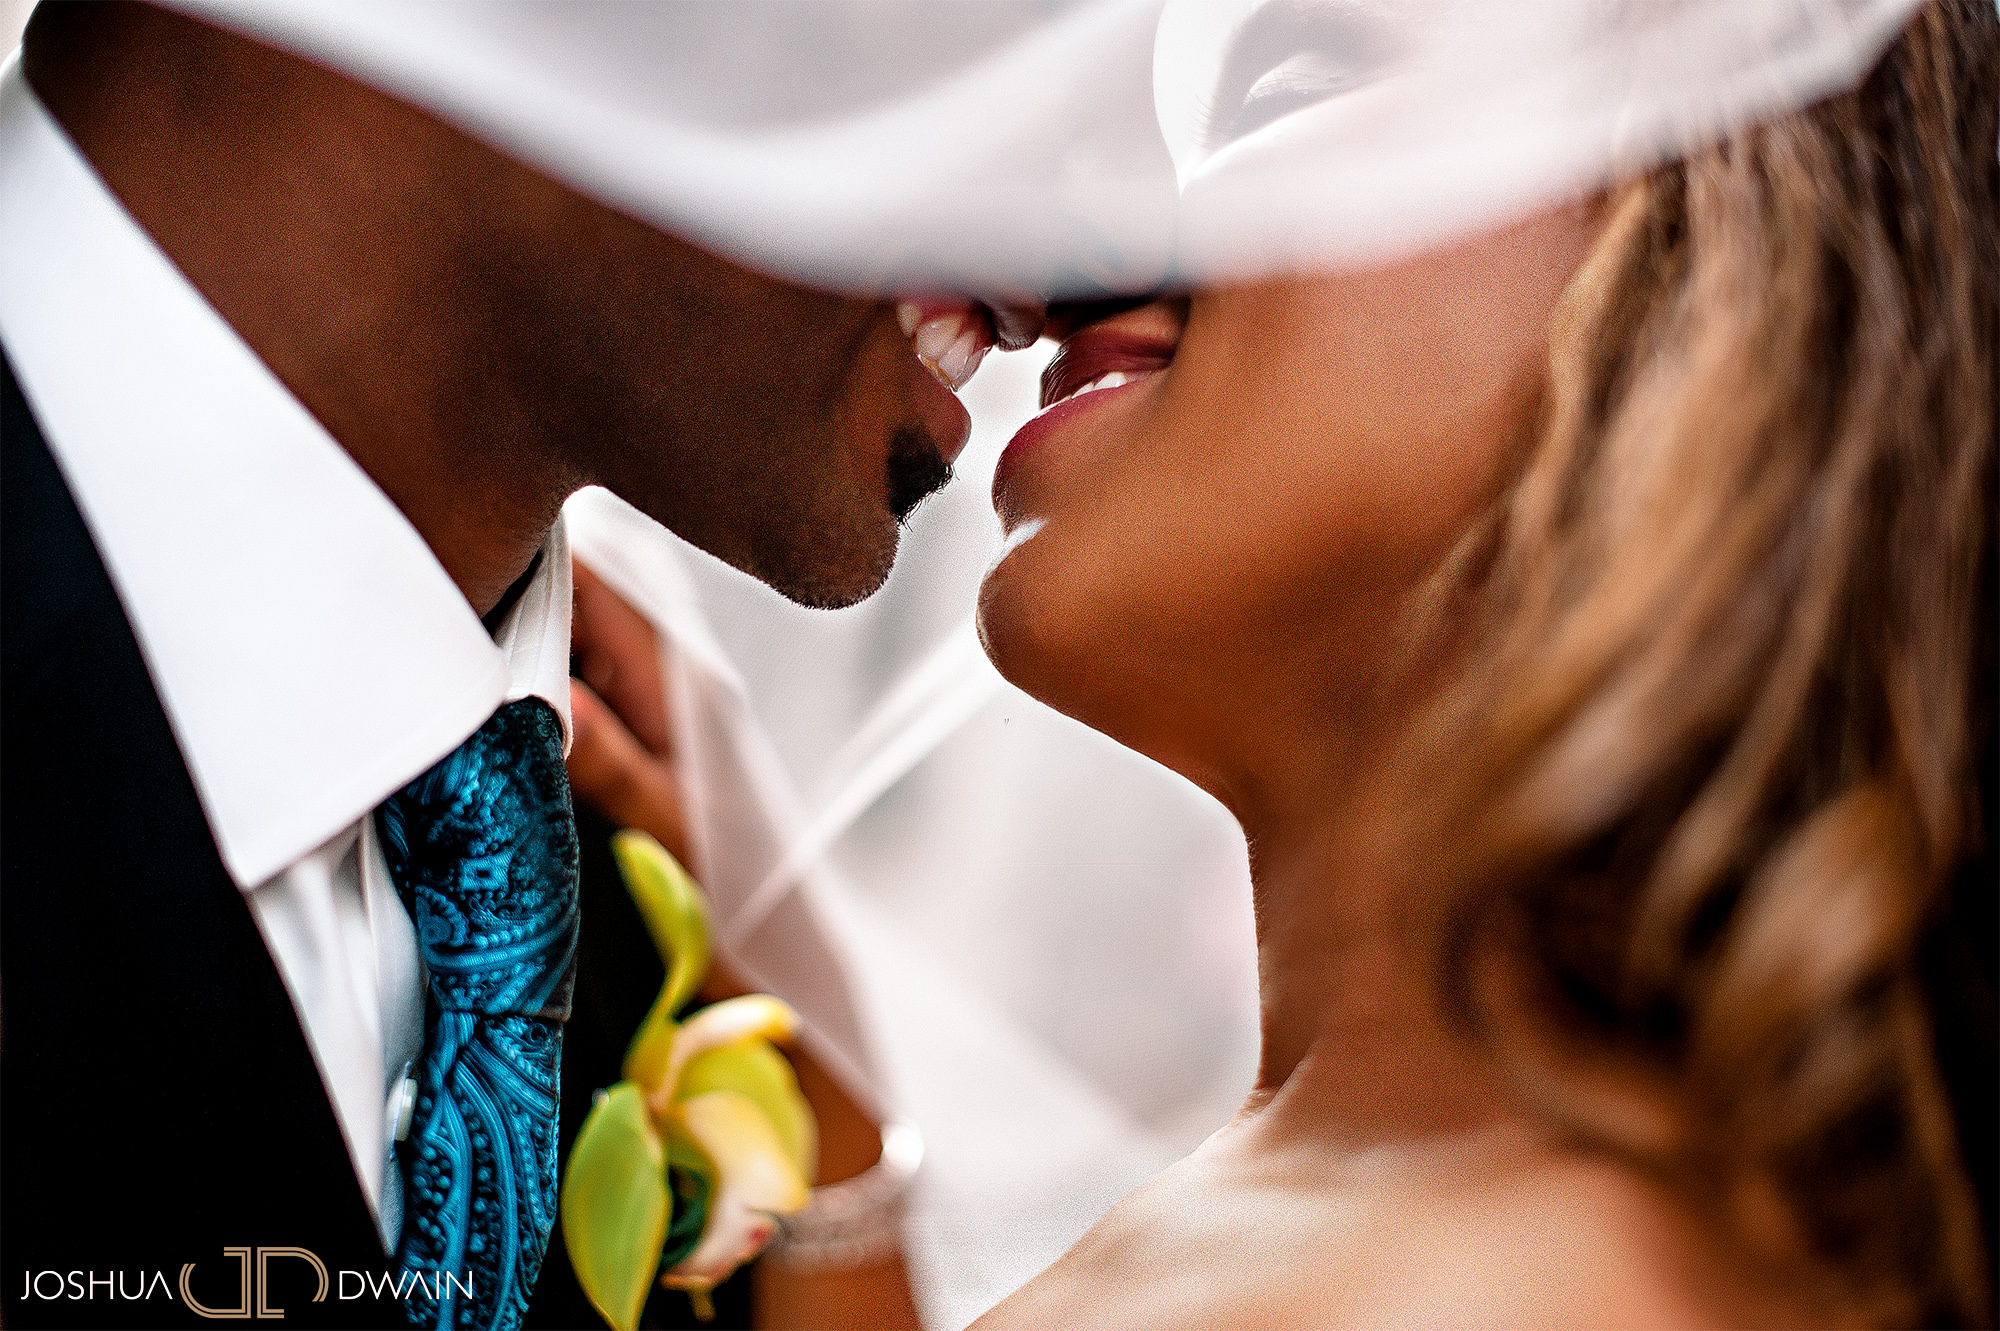 joshua-dwain-weddings-gallery-best-wedding-photographers-us-050